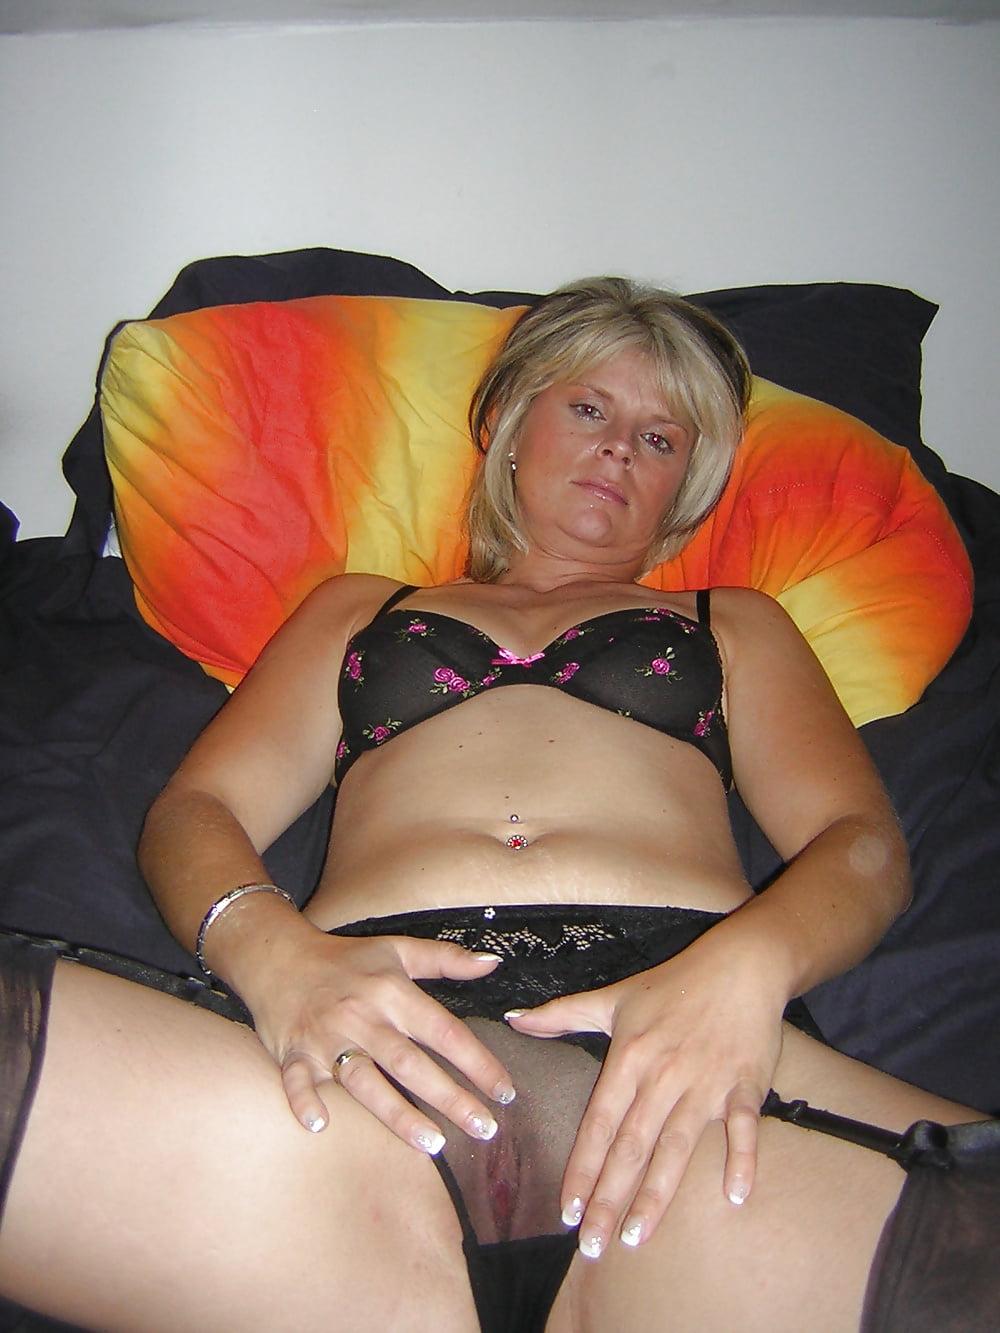 Fotos amaduras desnudas gratis